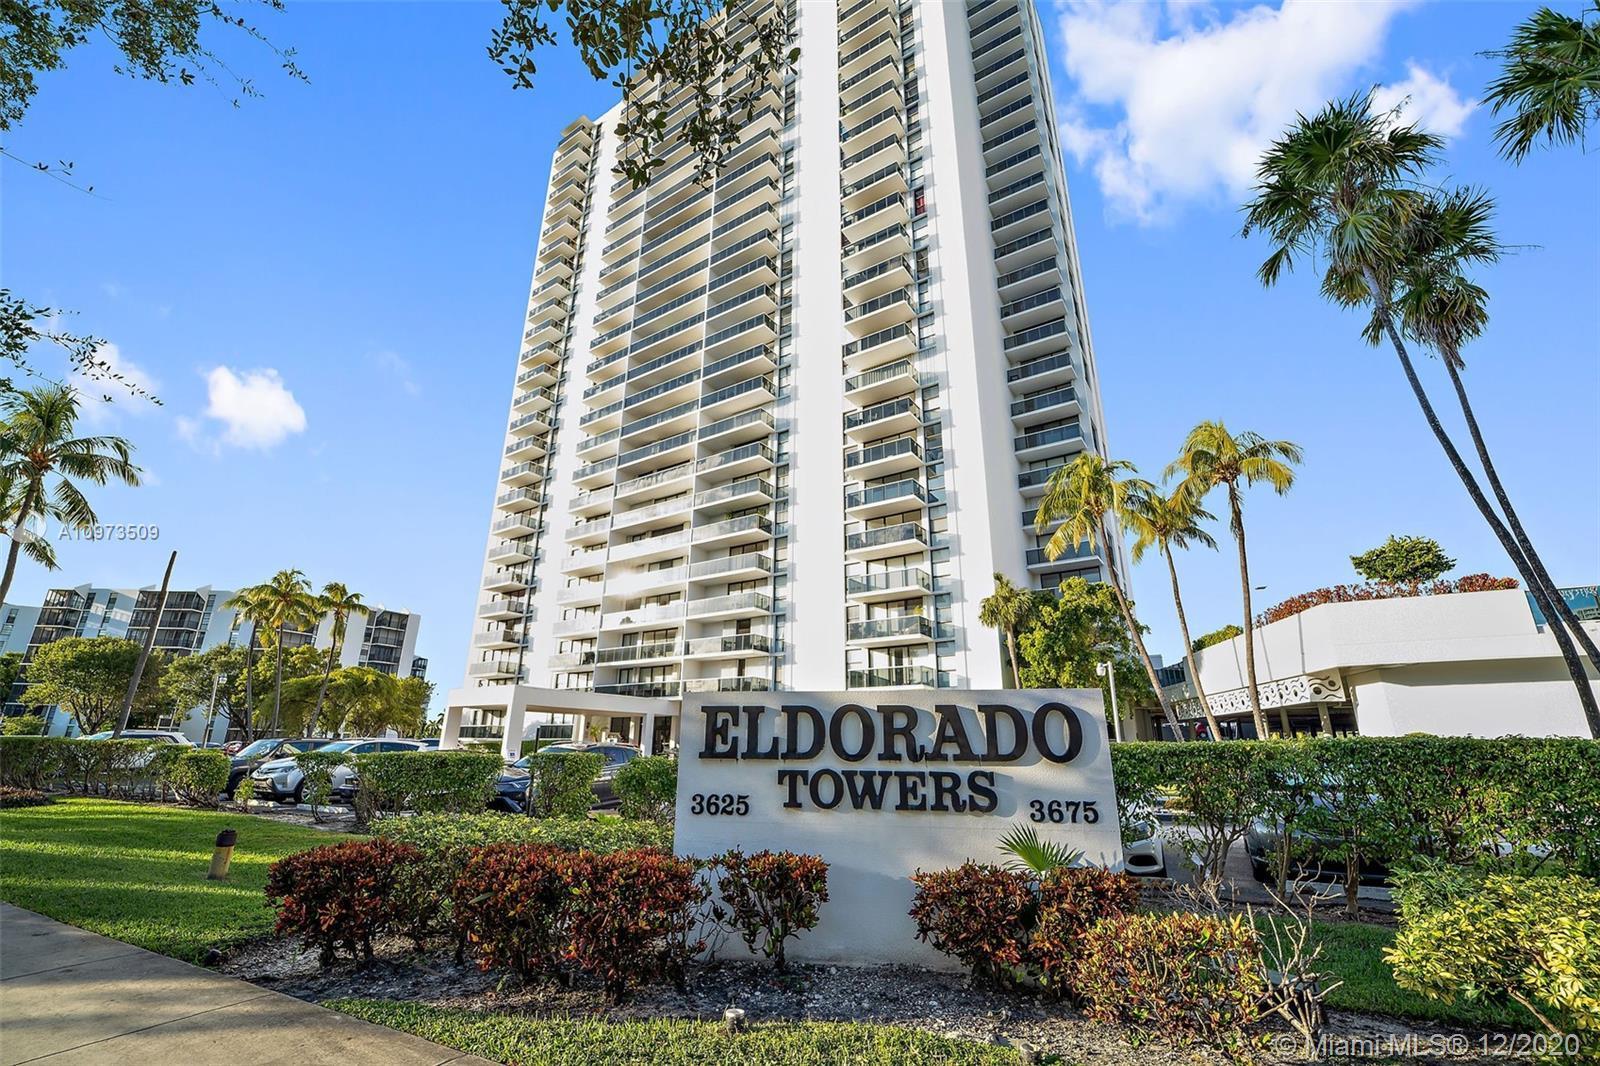 Eldorado Towers Condos for sale